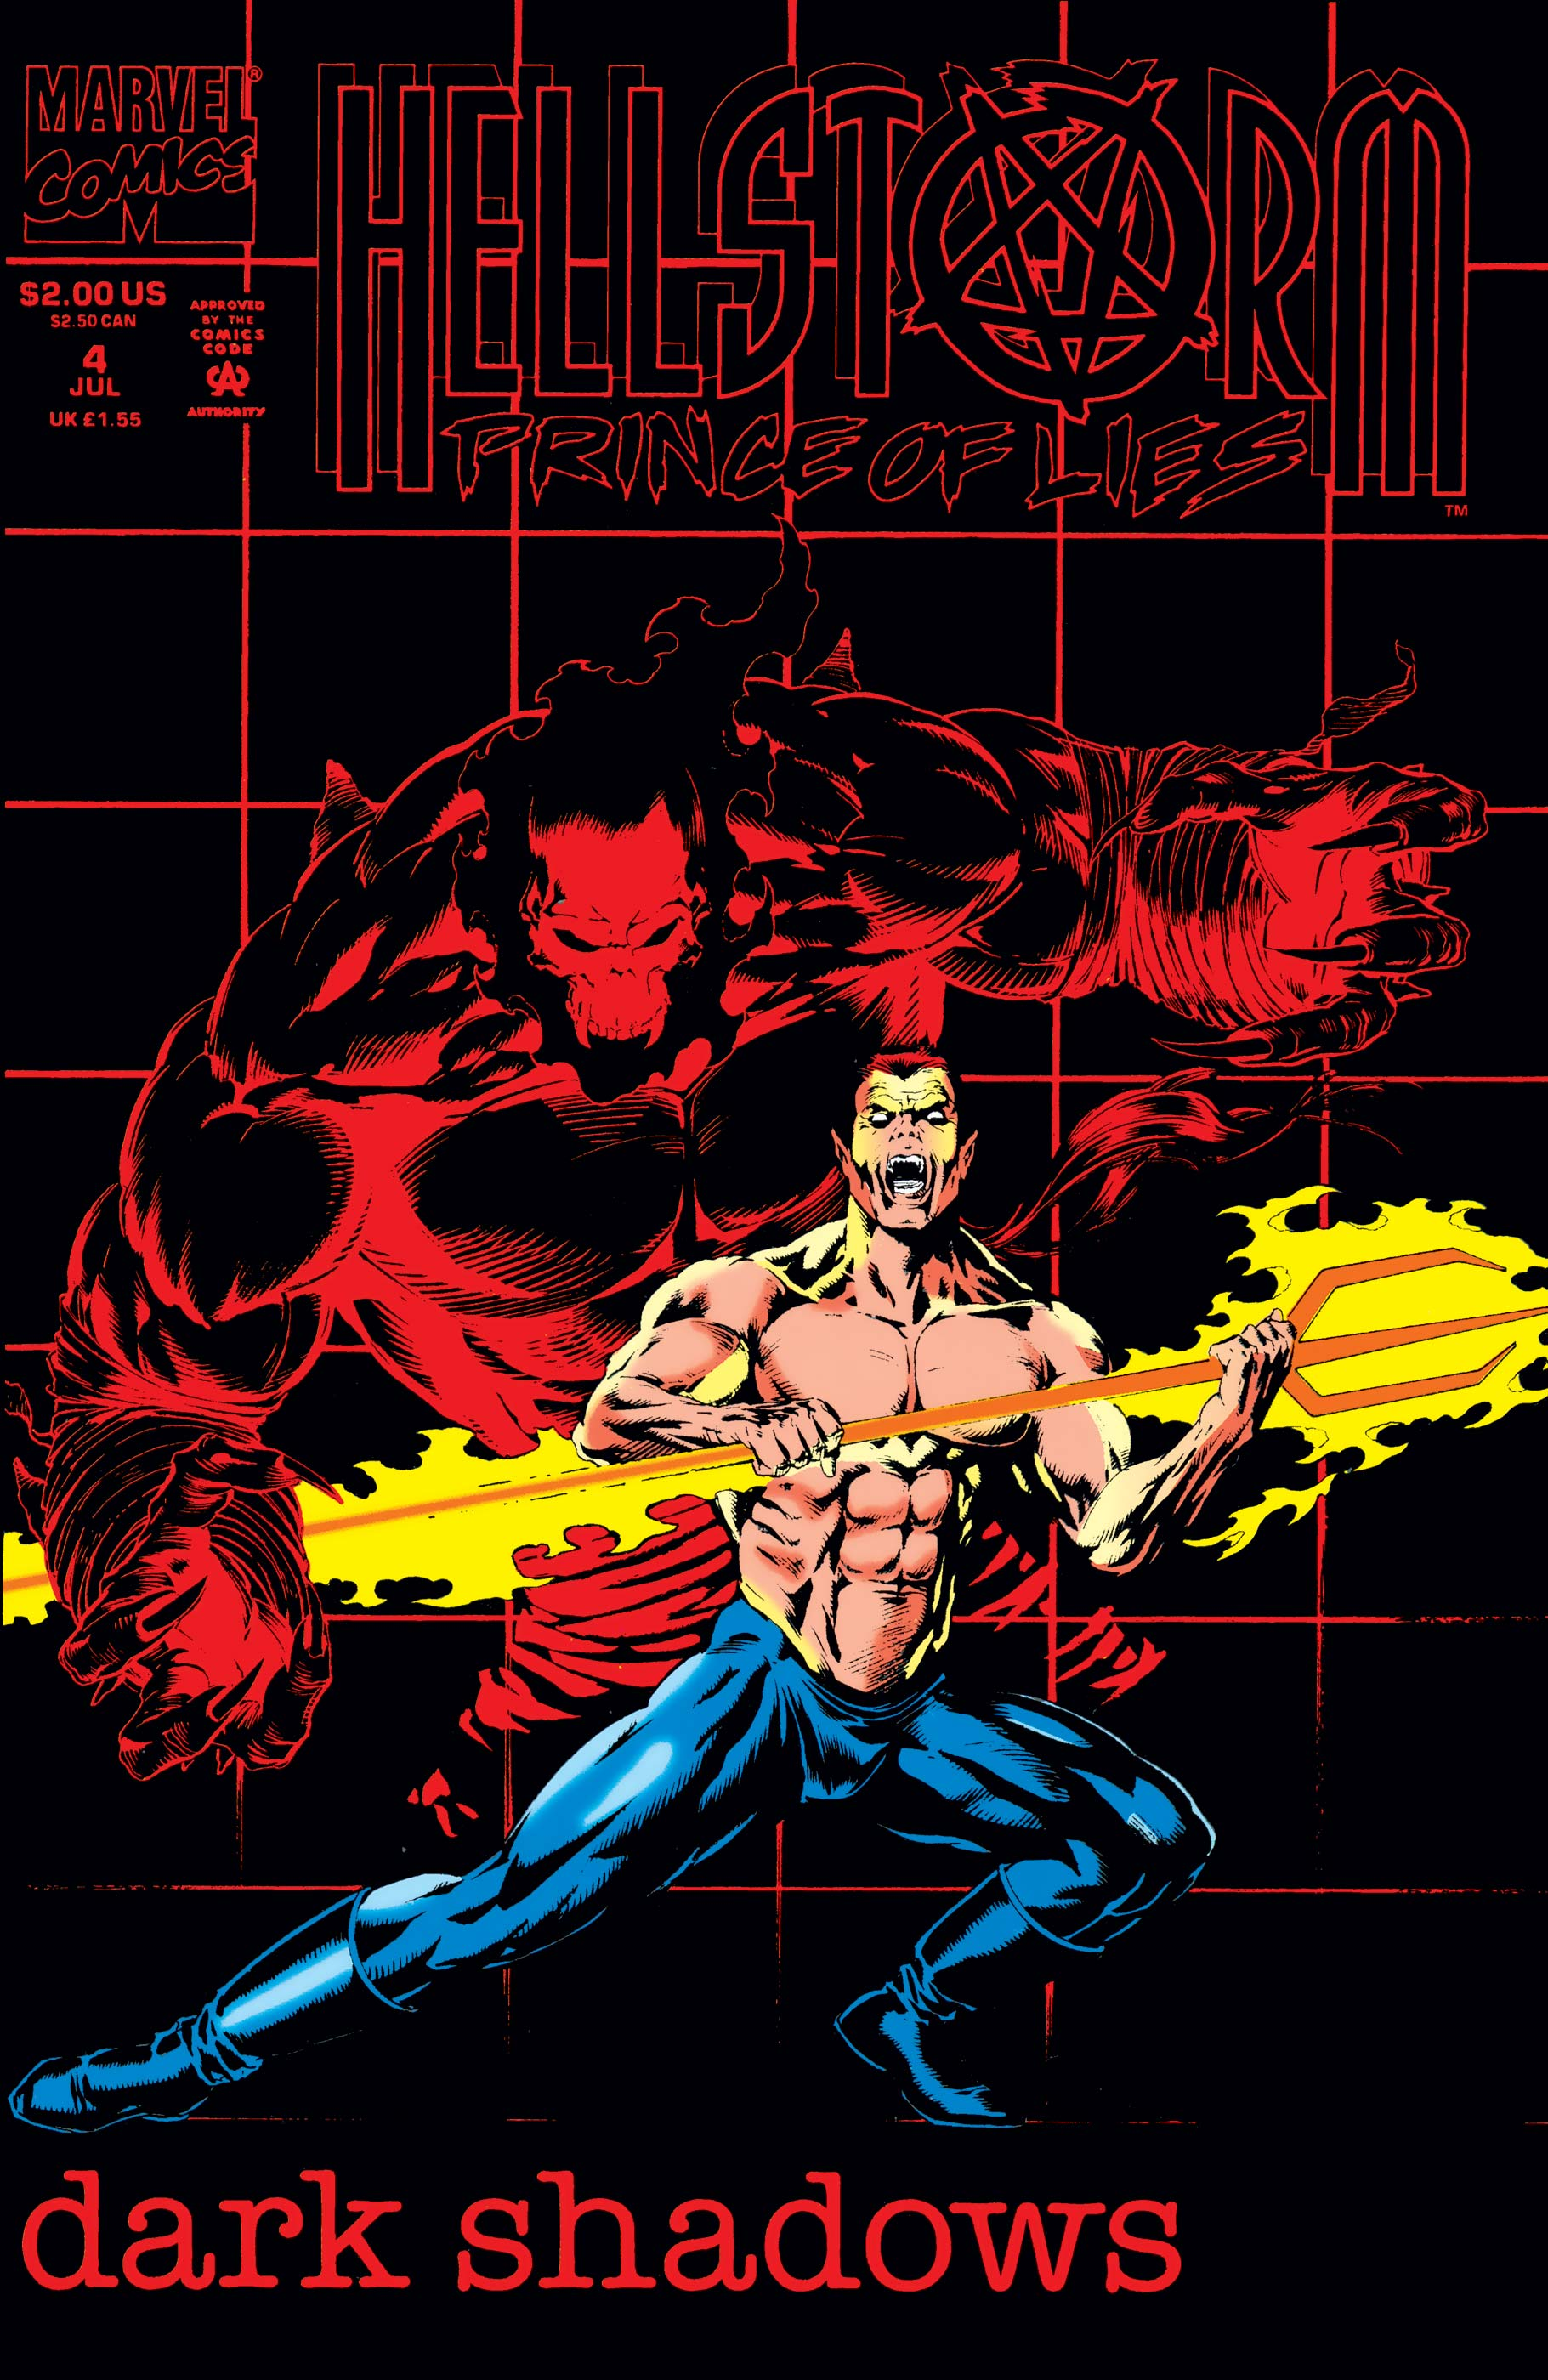 Hellstorm: Prince of Lies (1993) #4